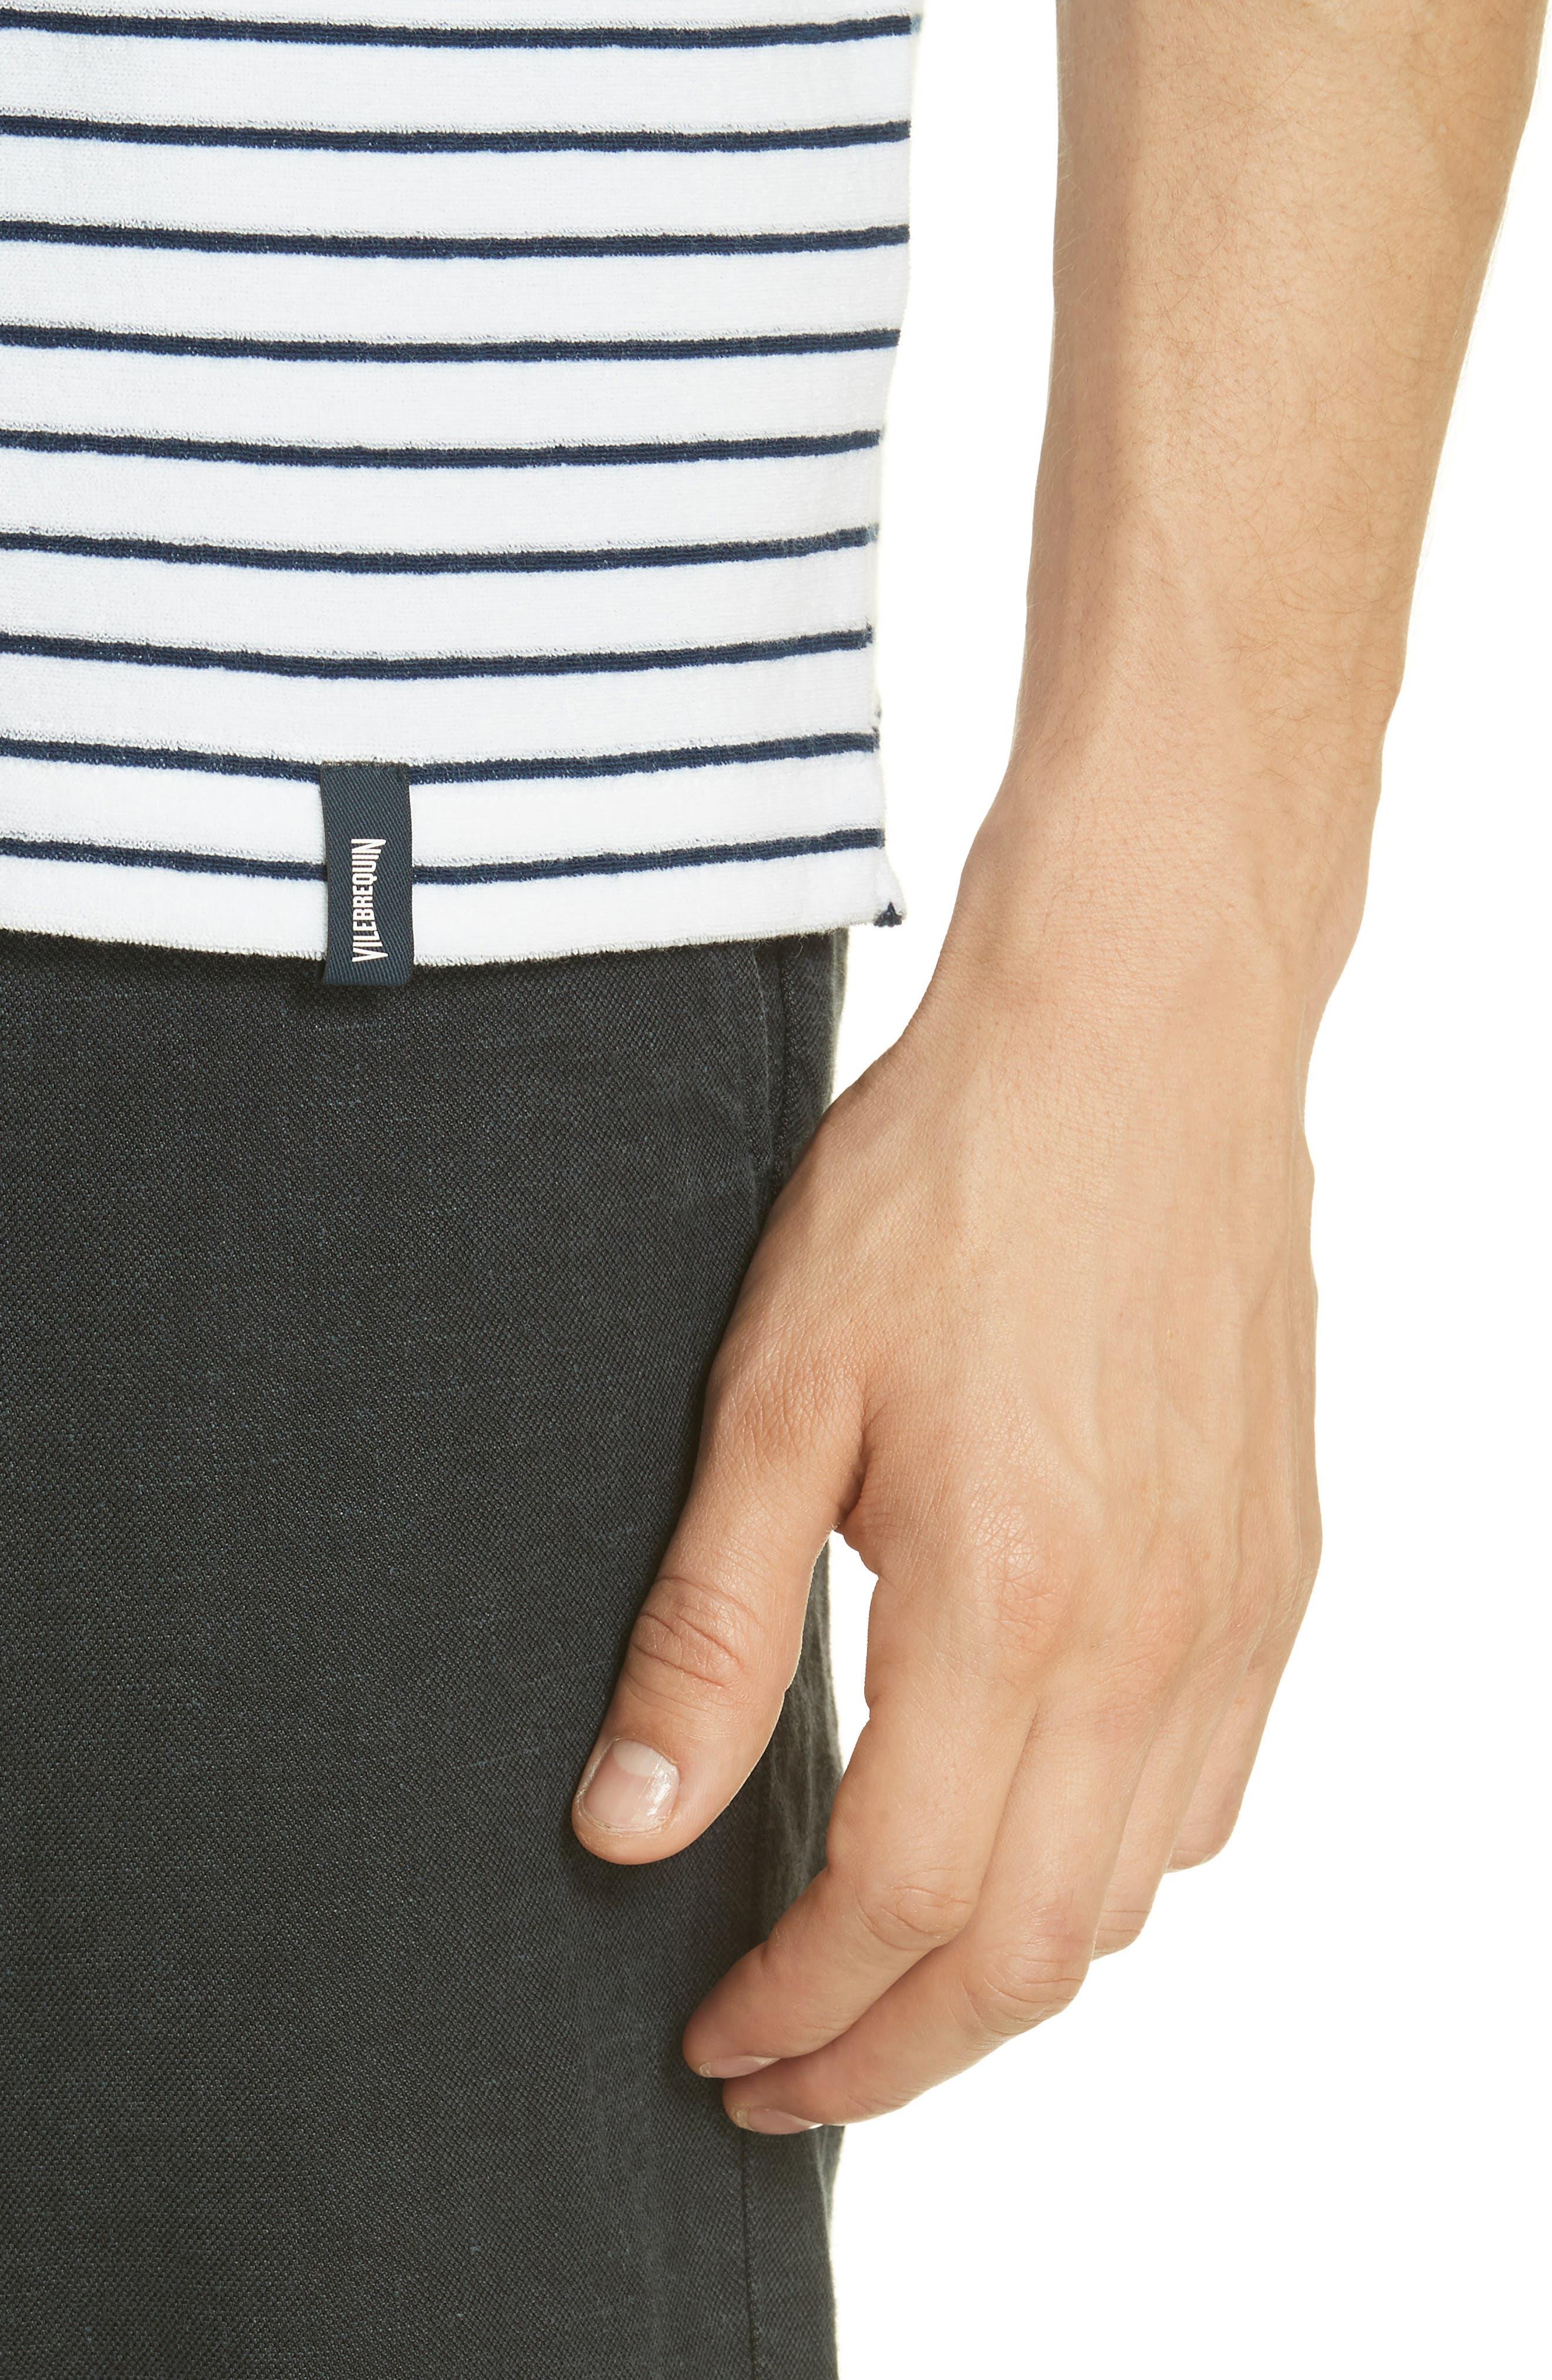 VILEBREQUIN, Stripe Terry T-Shirt, Alternate thumbnail 4, color, 402